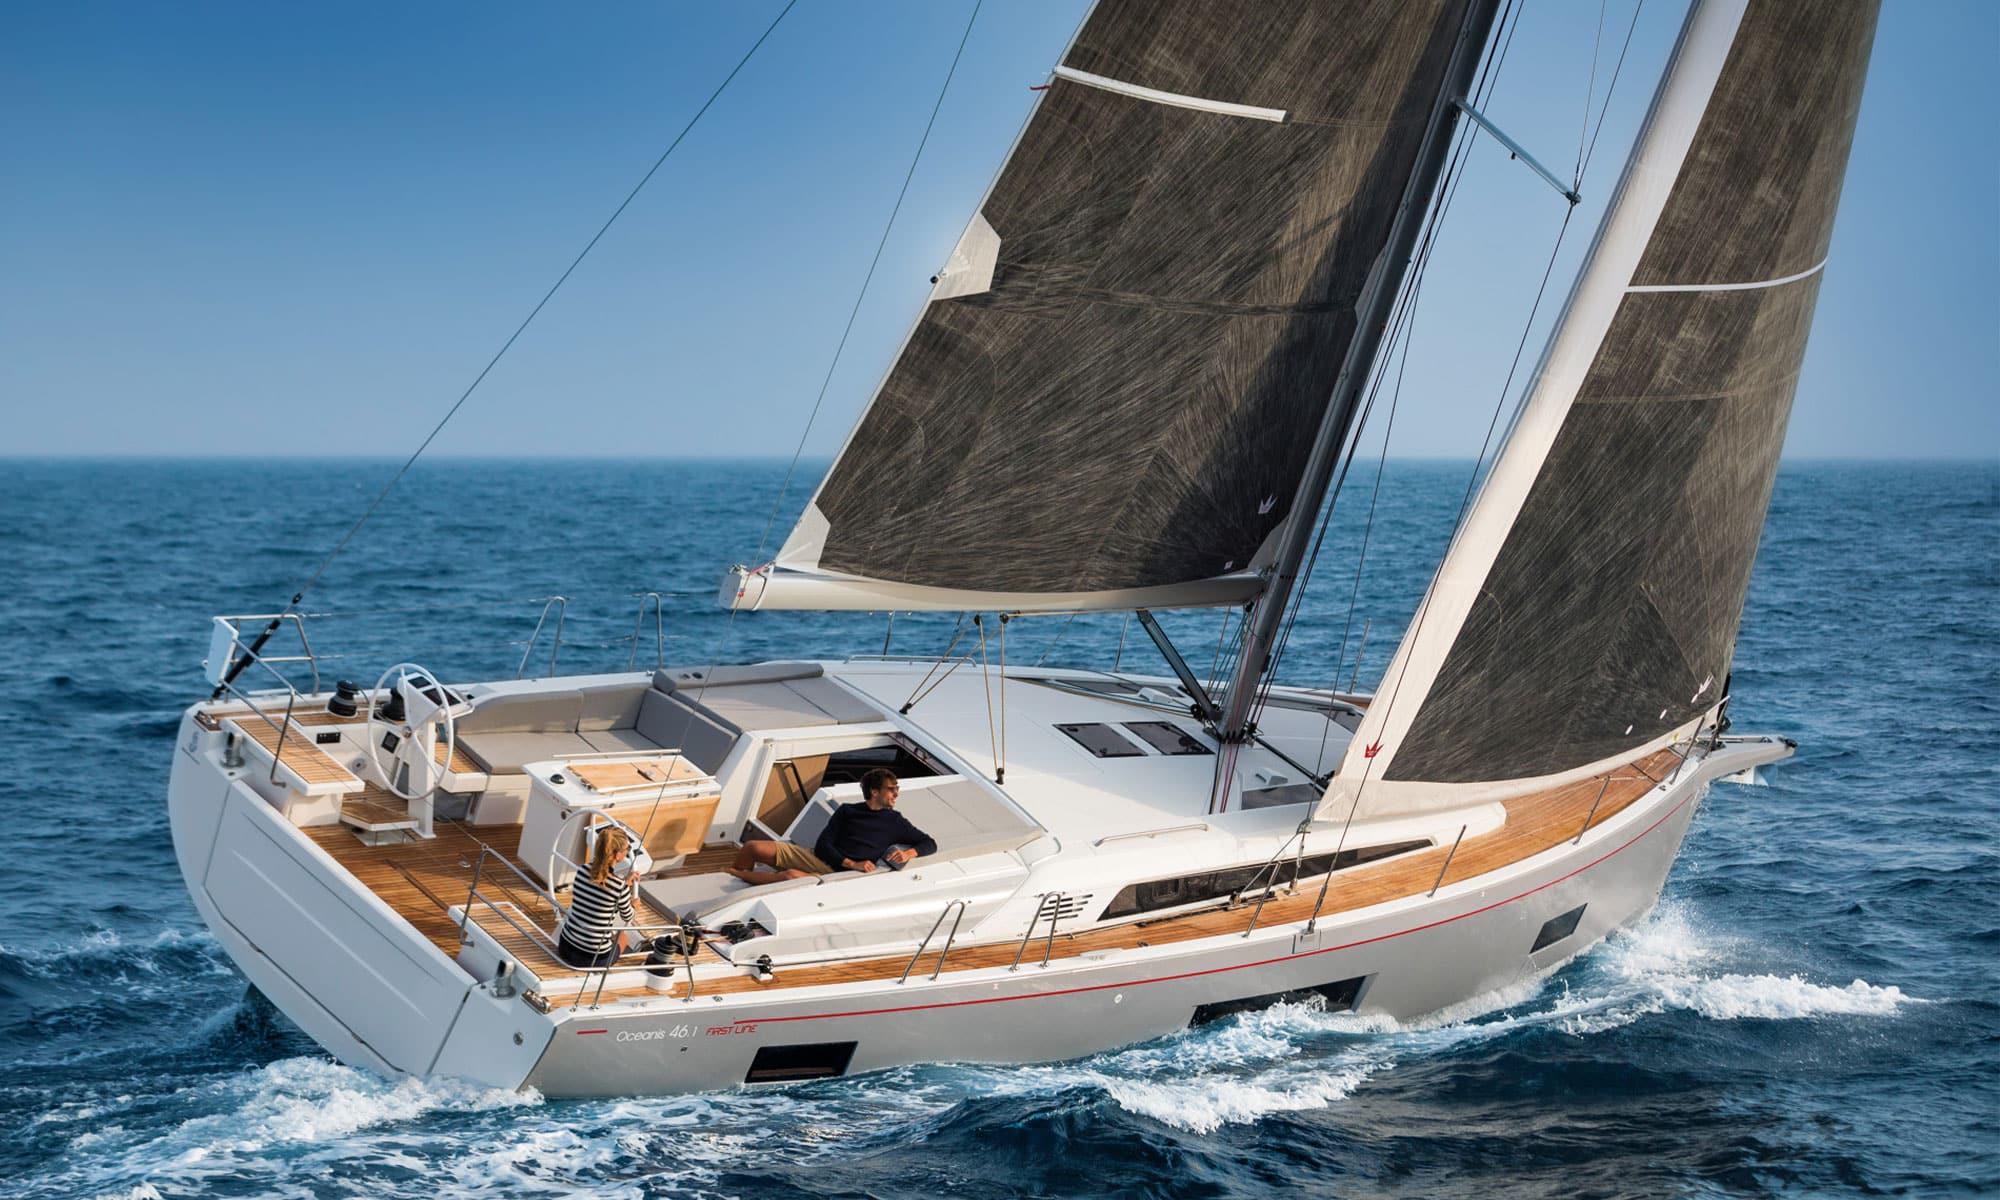 Una coppia naviga in mare aperto su una barca a vela Oceanis 46.1 First Line del marchio Beneteau.